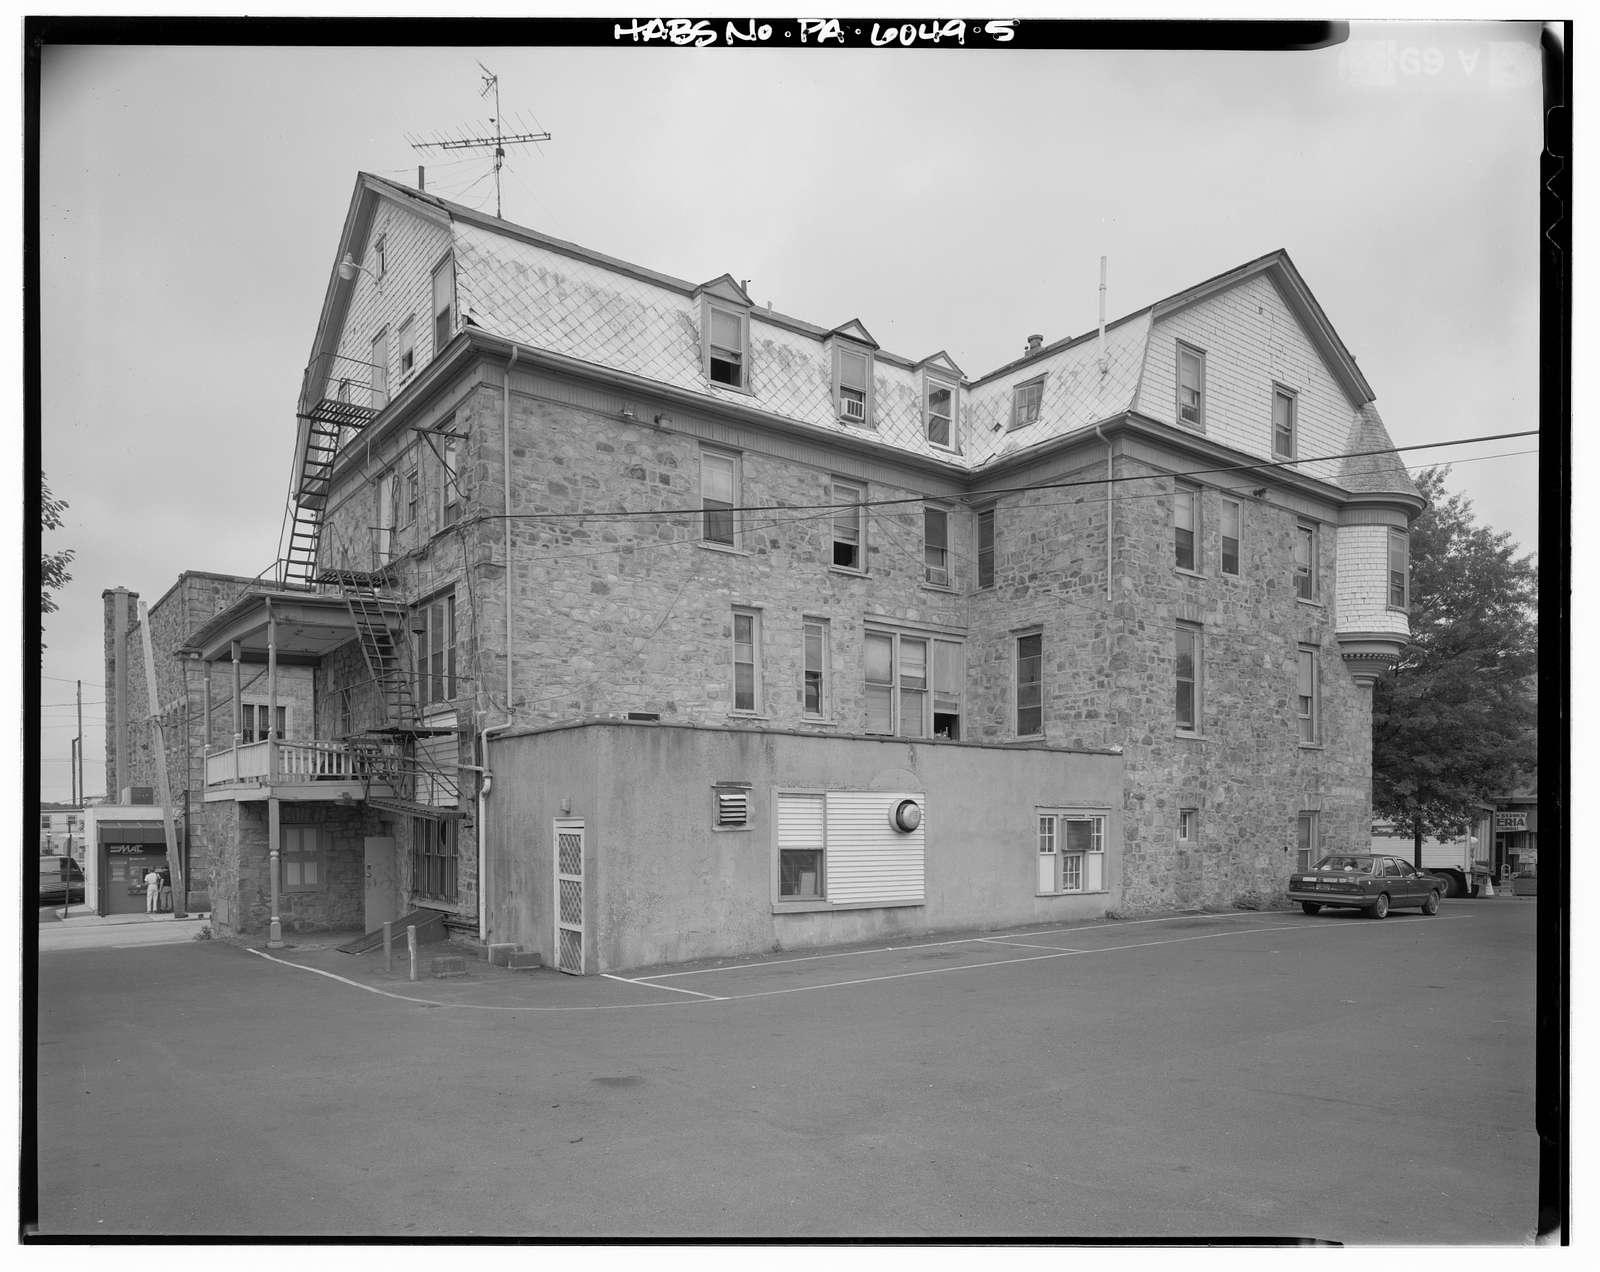 Wyndham Hotel, 34 East Butler Avenue, Ambler, Montgomery County, PA